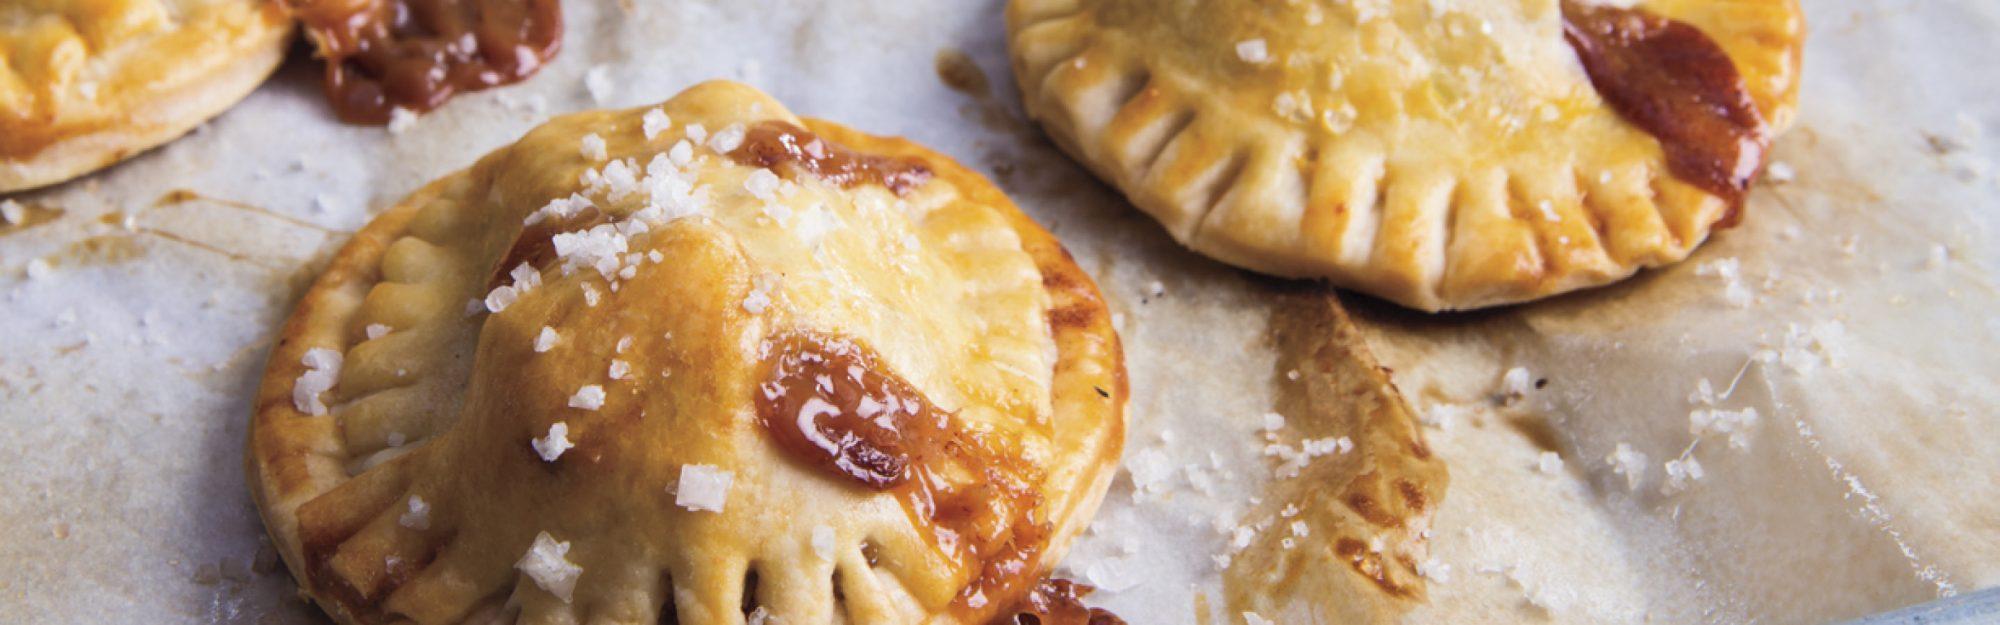 salted apple caramel hand pies